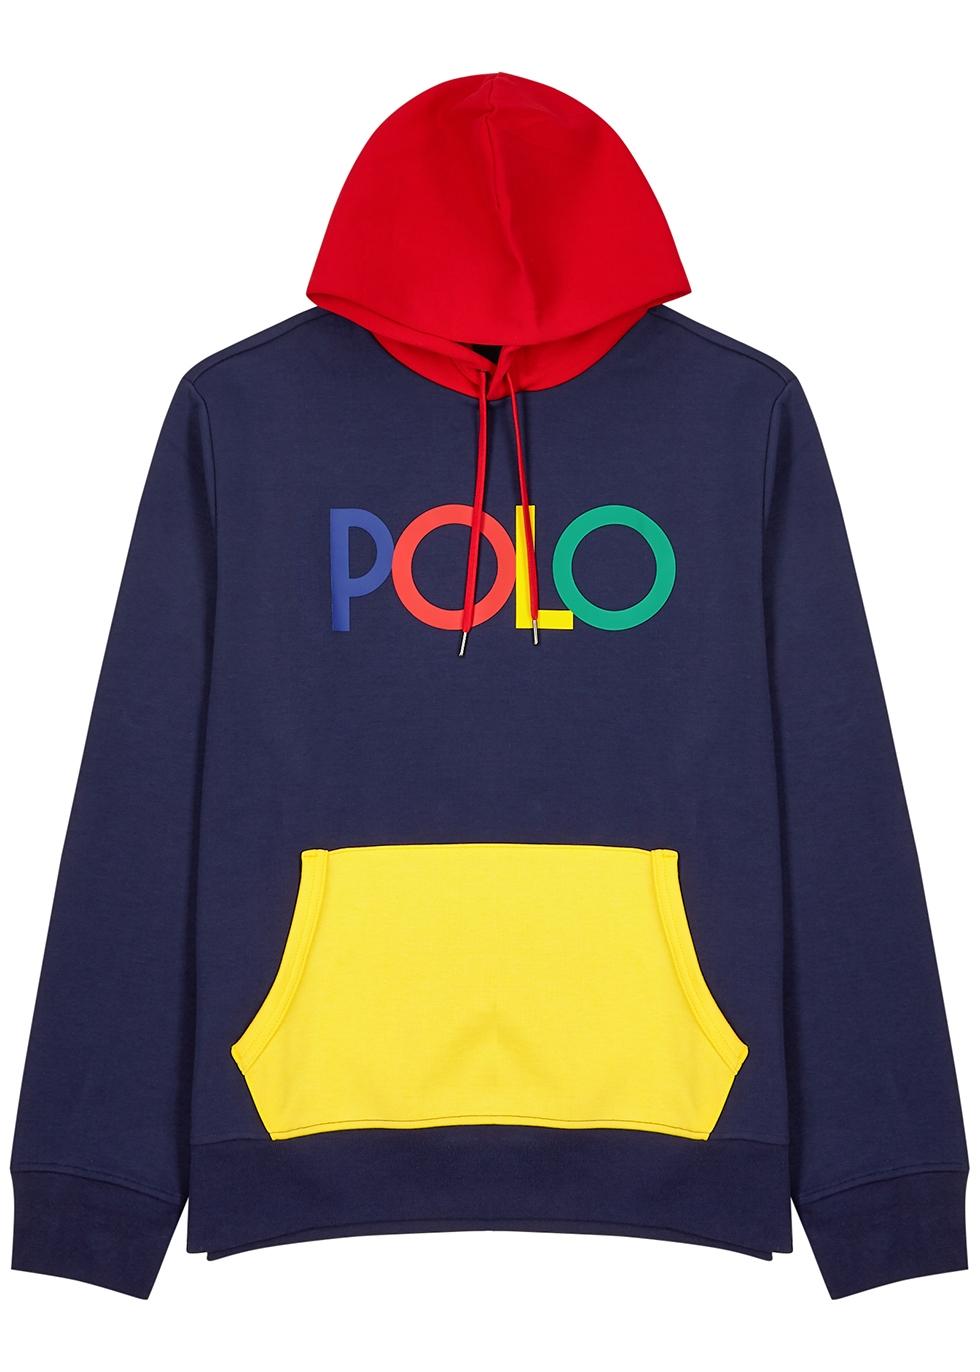 Navy logo hooded jersey sweatshirt